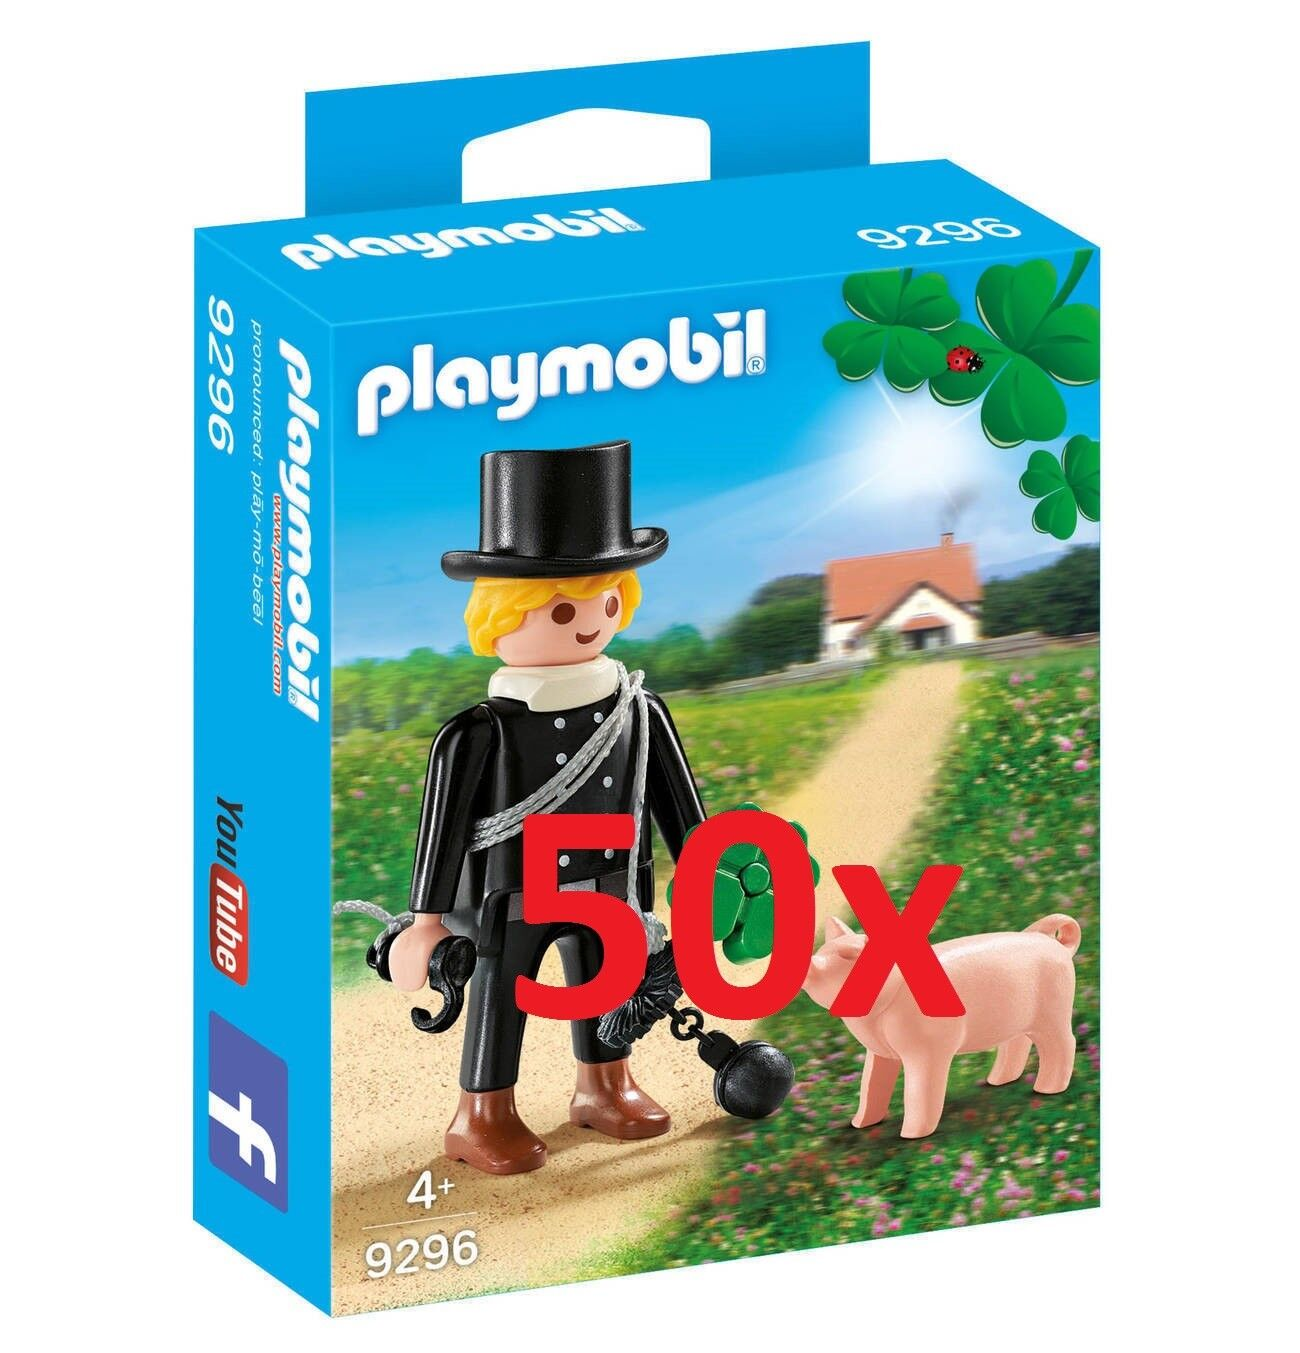 Playmobil 50x 9296 Spazzacamino con Maialino Nuovo Conf. Orig.